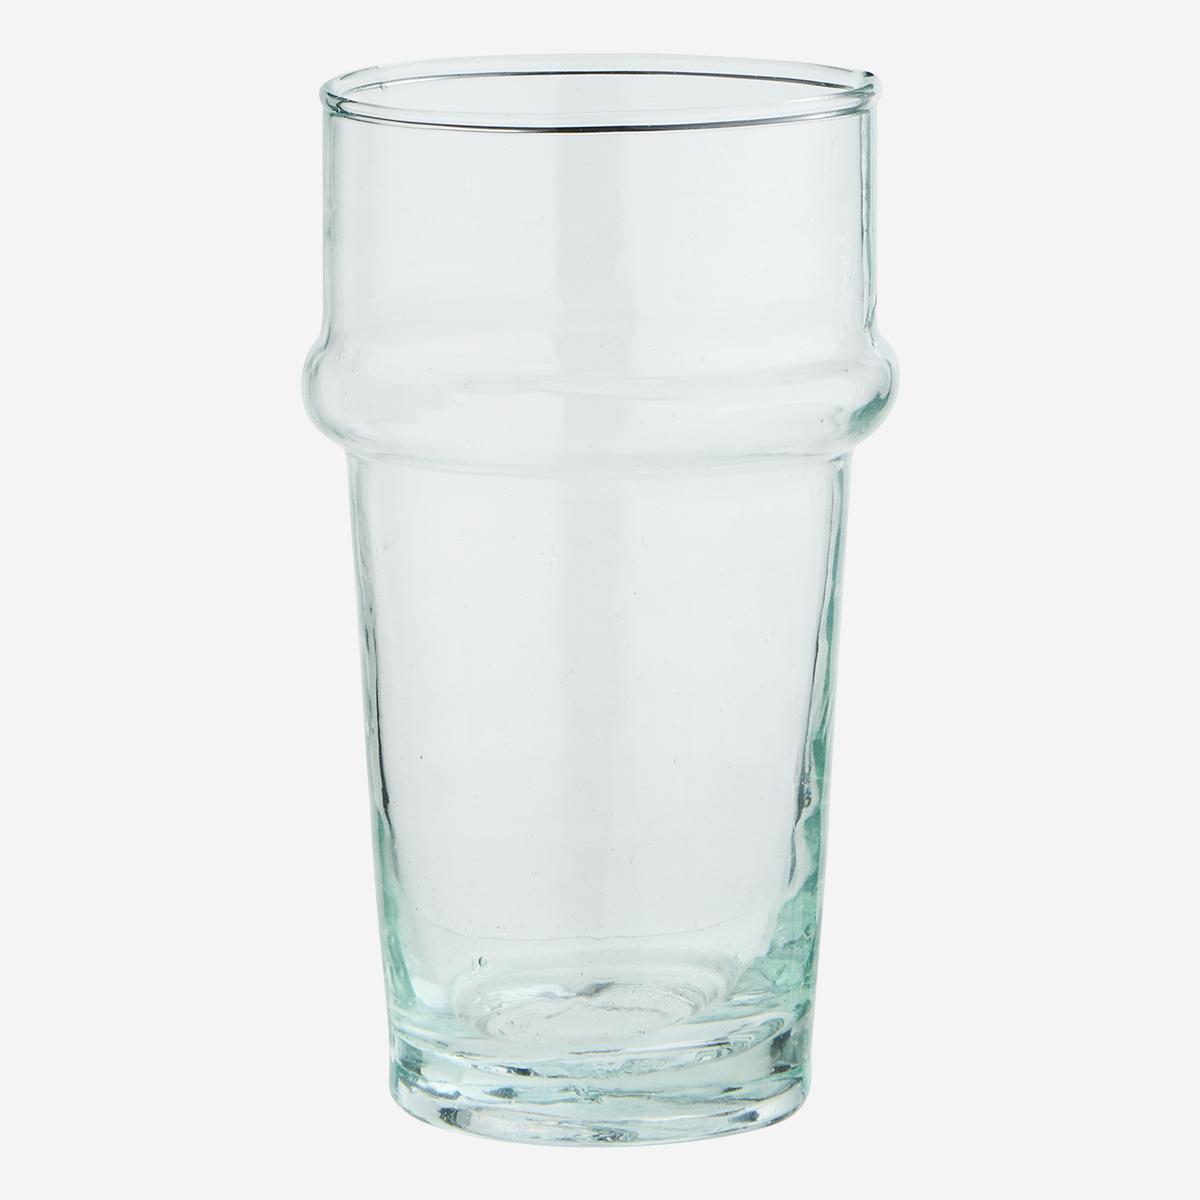 Verre Beldi haut transparent (verre recyclé) * Madam Stoltz